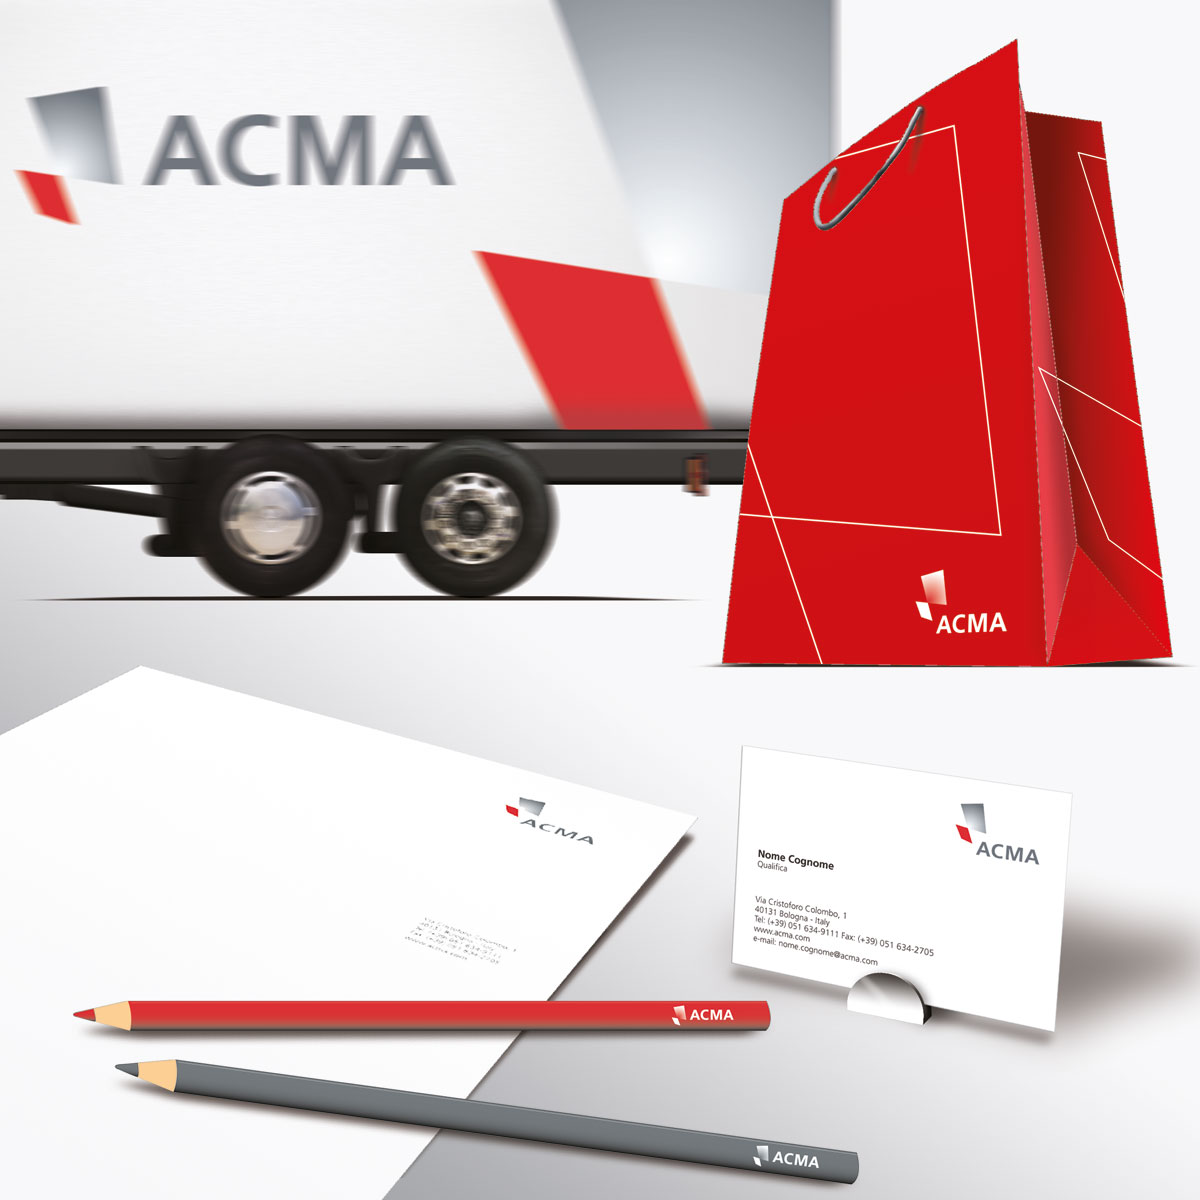 ACMA-01.jpg